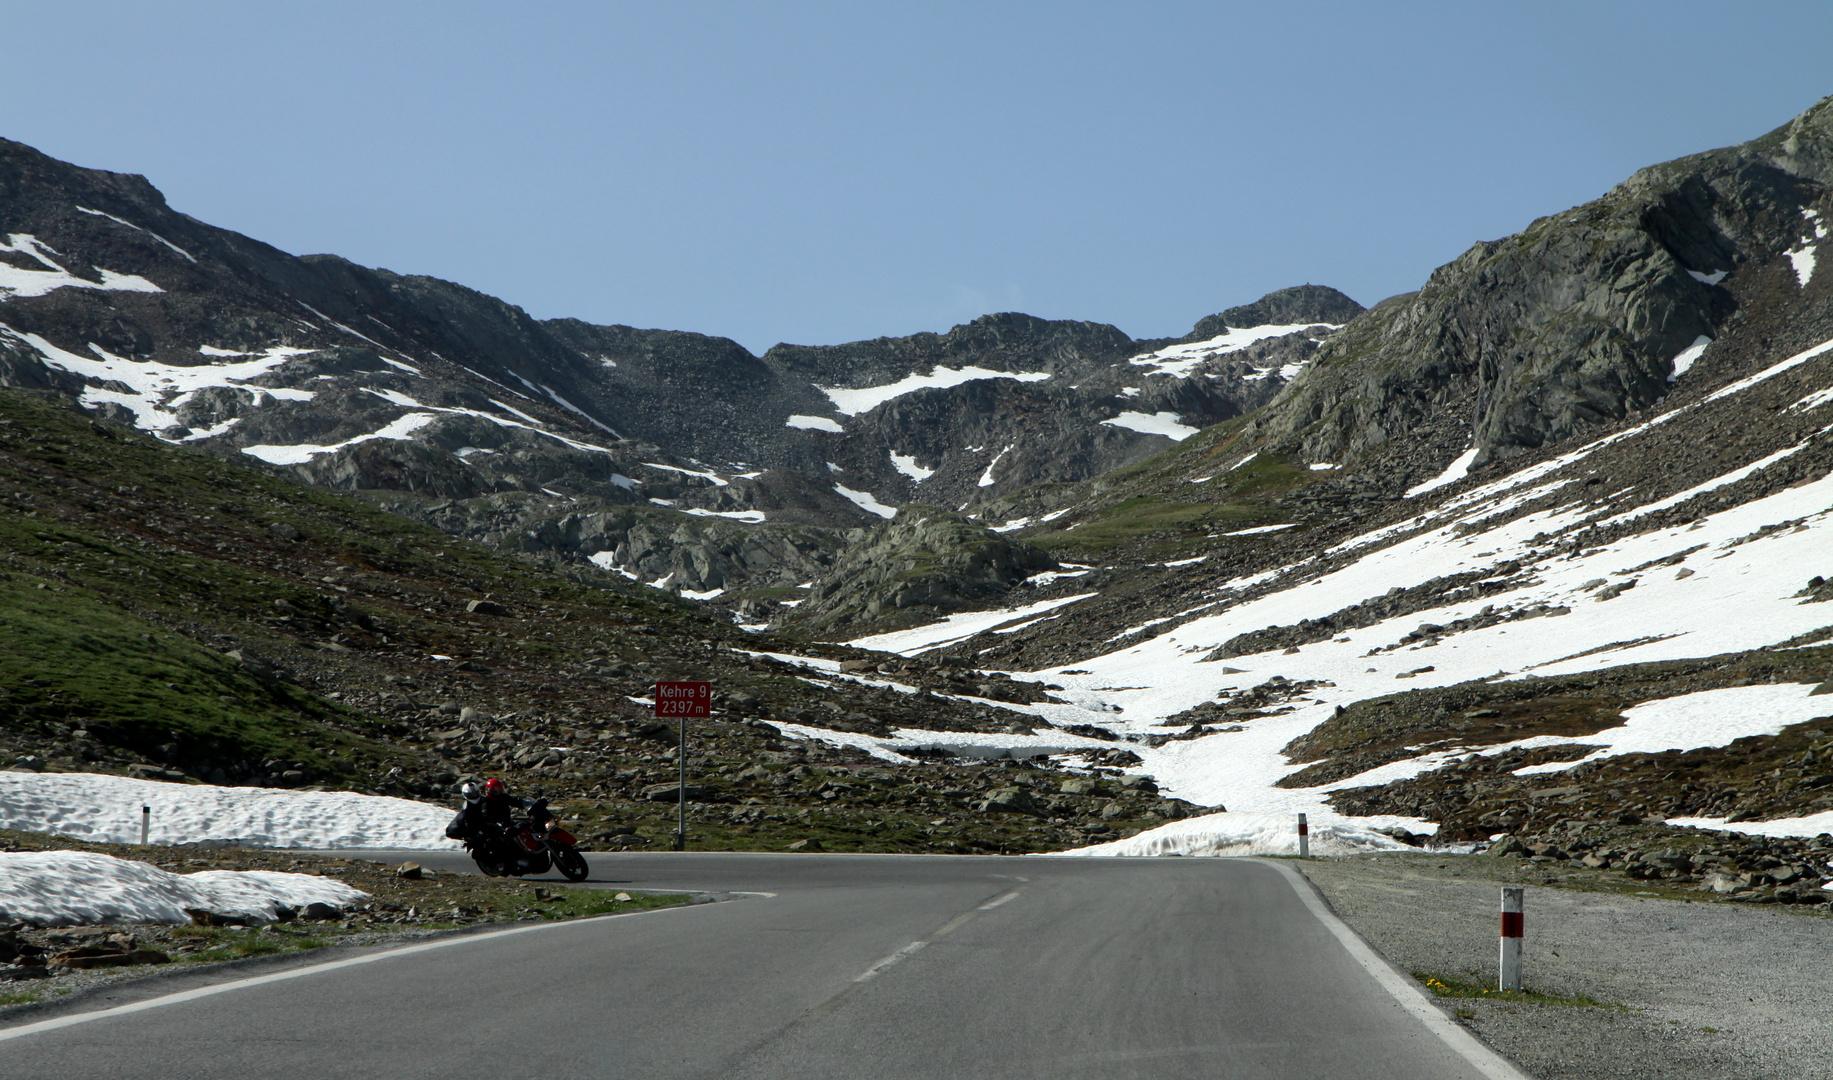 auf dem Weg vom Ötztal, Nordtirol (A)...